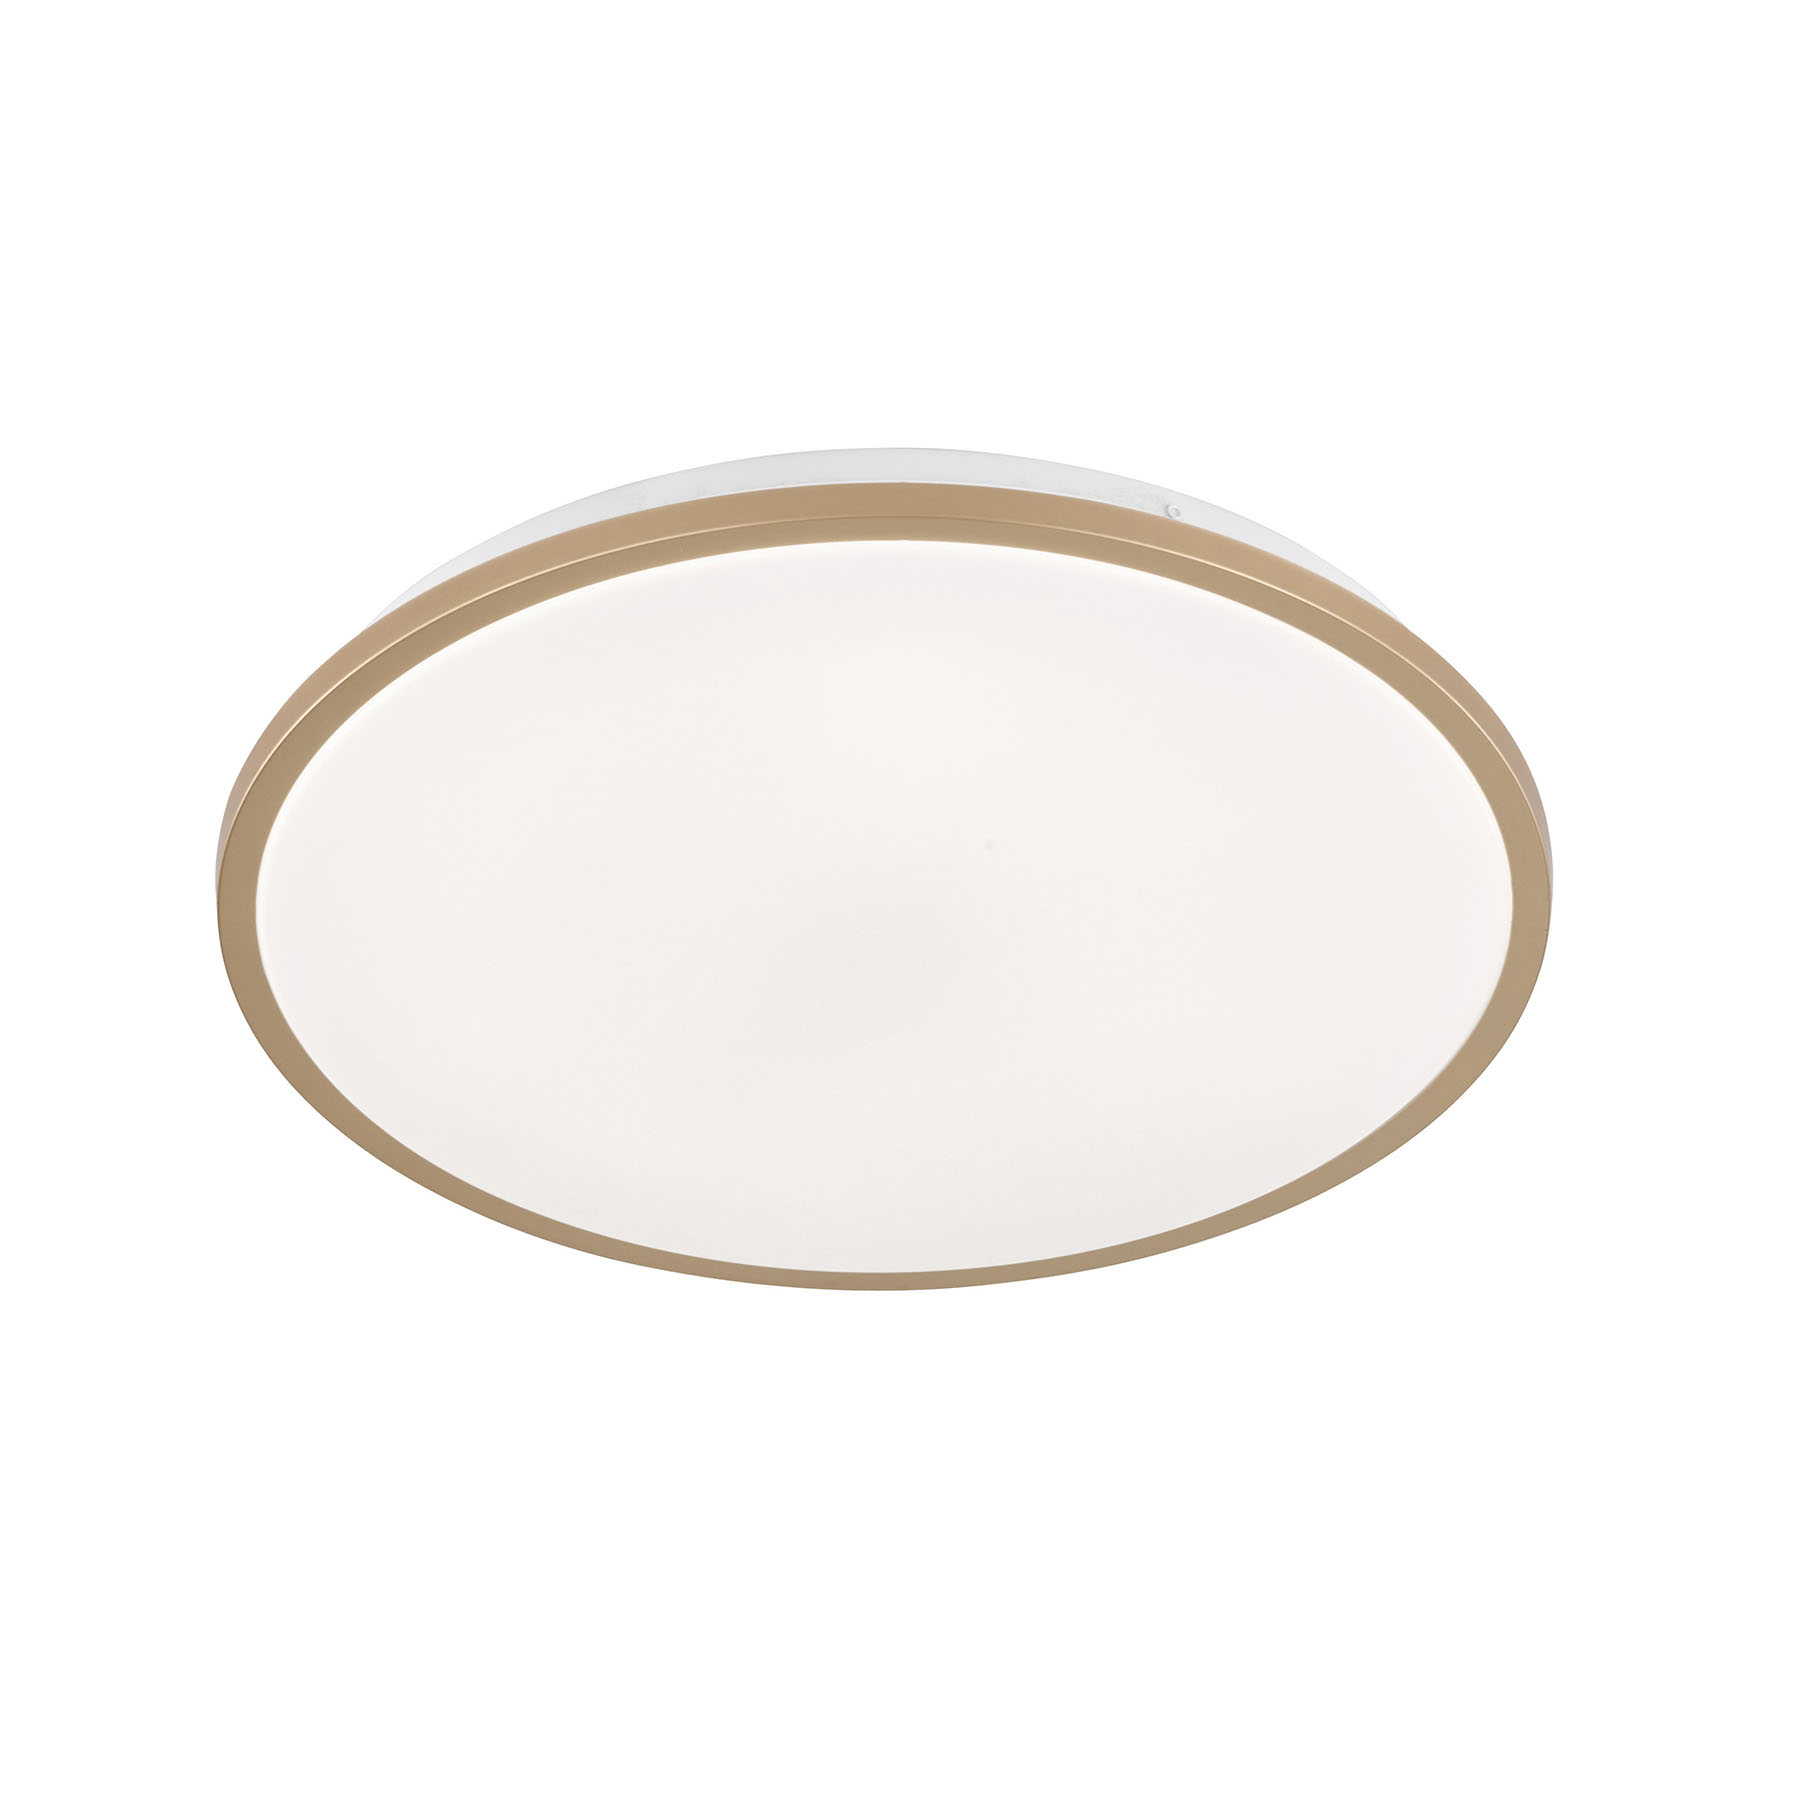 LED plafondlamp Jaso BS, Ø 39 cm, goud